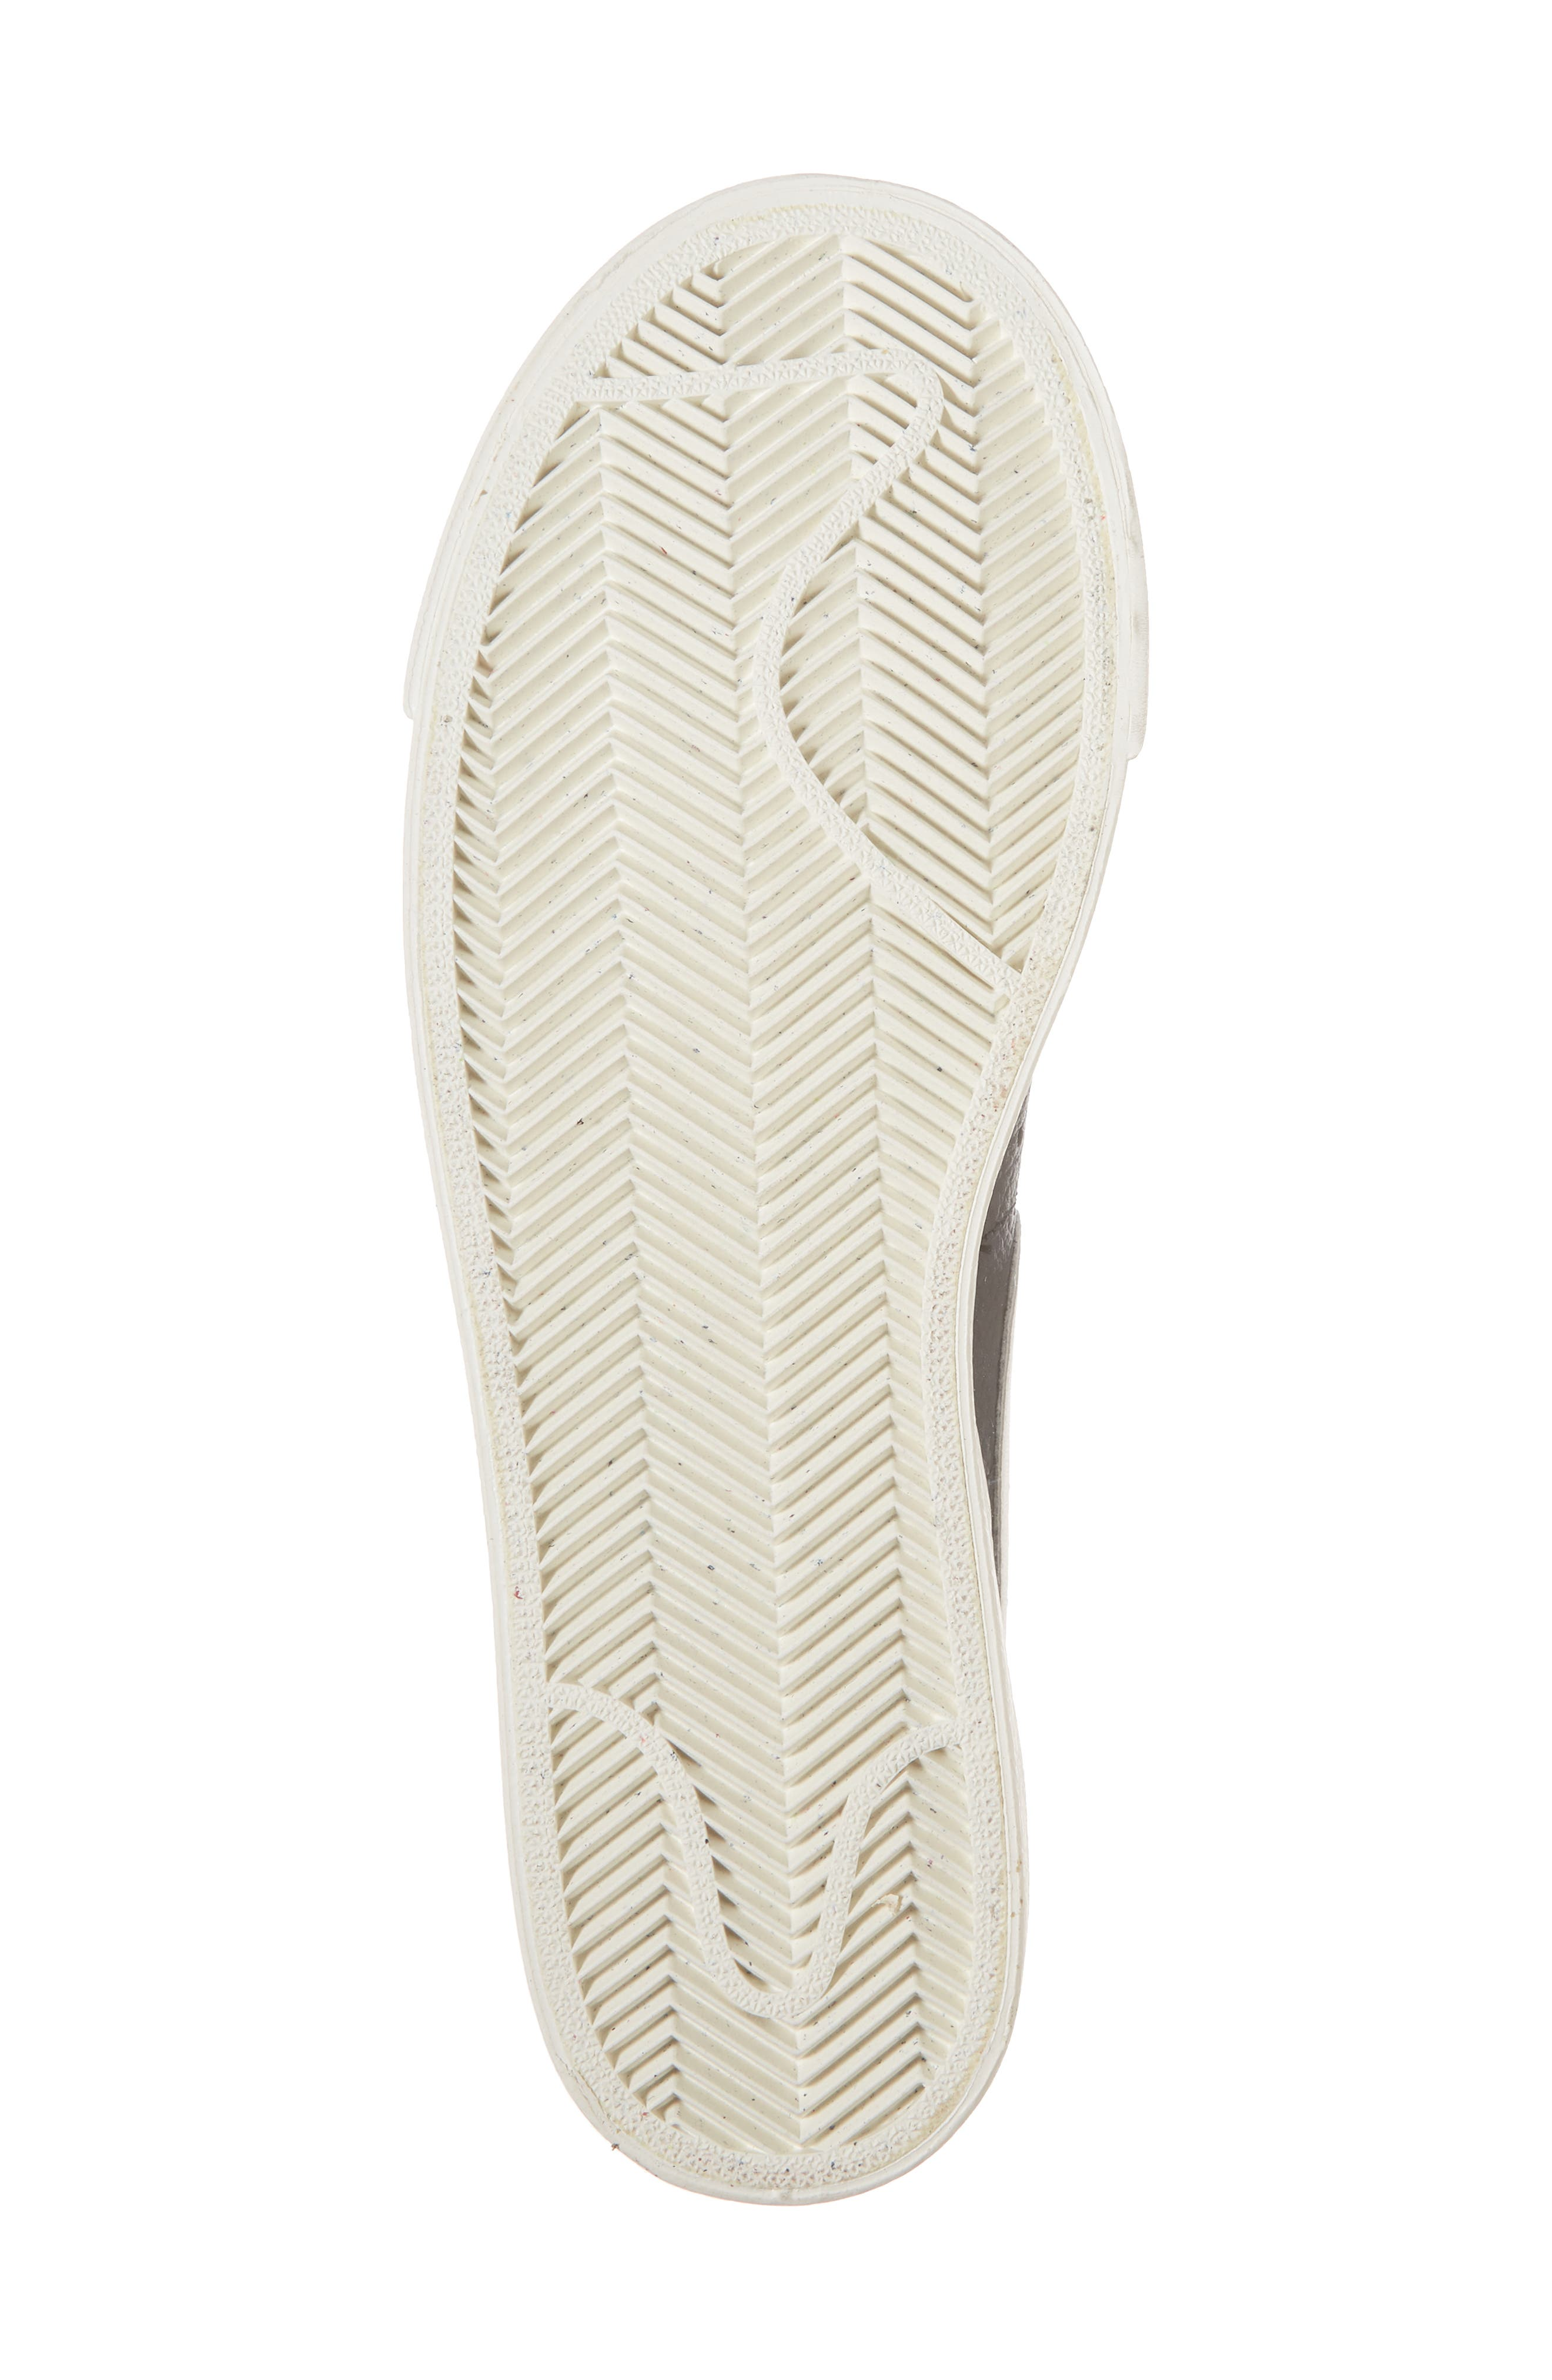 Blazer Premium Low Sneaker,                             Alternate thumbnail 6, color,                             Black/ White/ Black